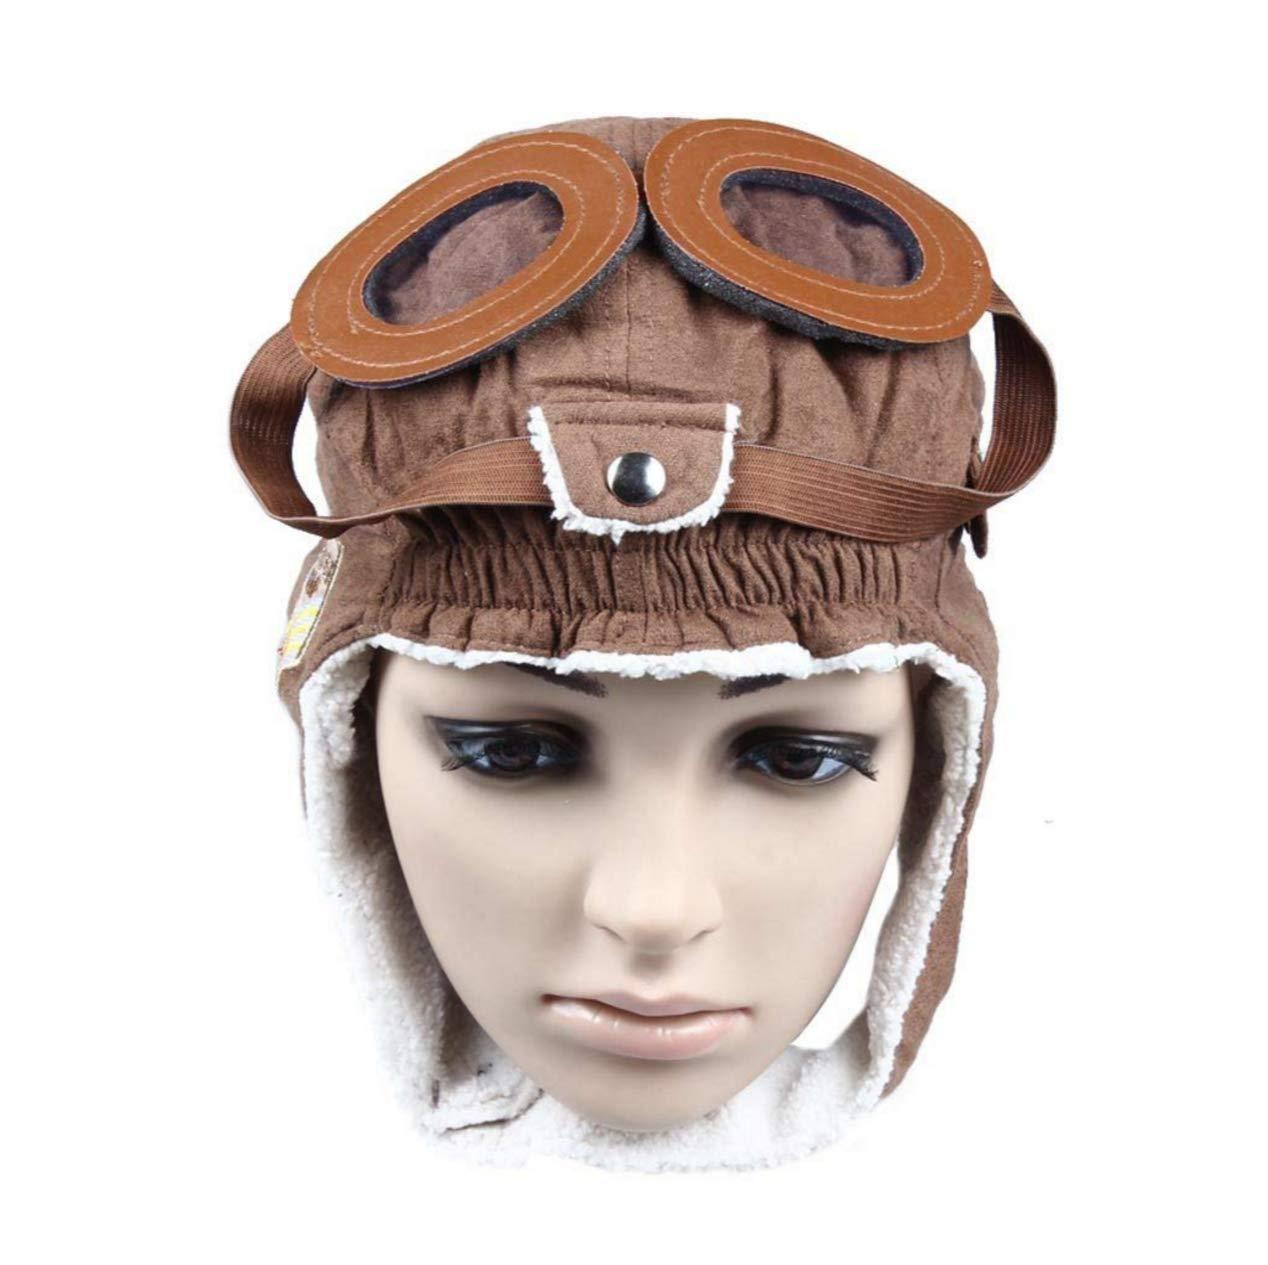 20fed4076226b Amazon.com: Warm Baby Kid Toddler Winter Earflap Pilot Cap Hat Beanie  Flight Helmet: Toys & Games